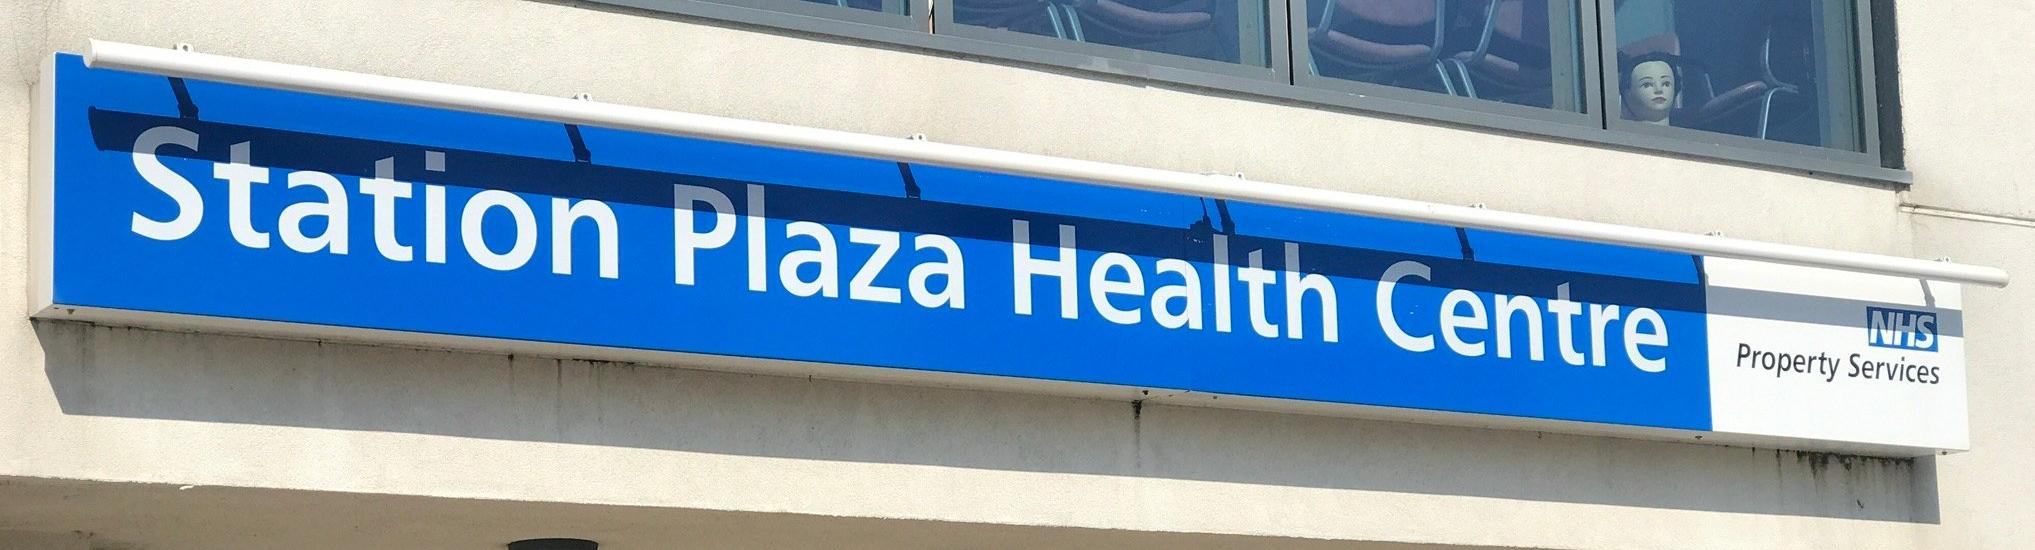 Walk-in Centre signage